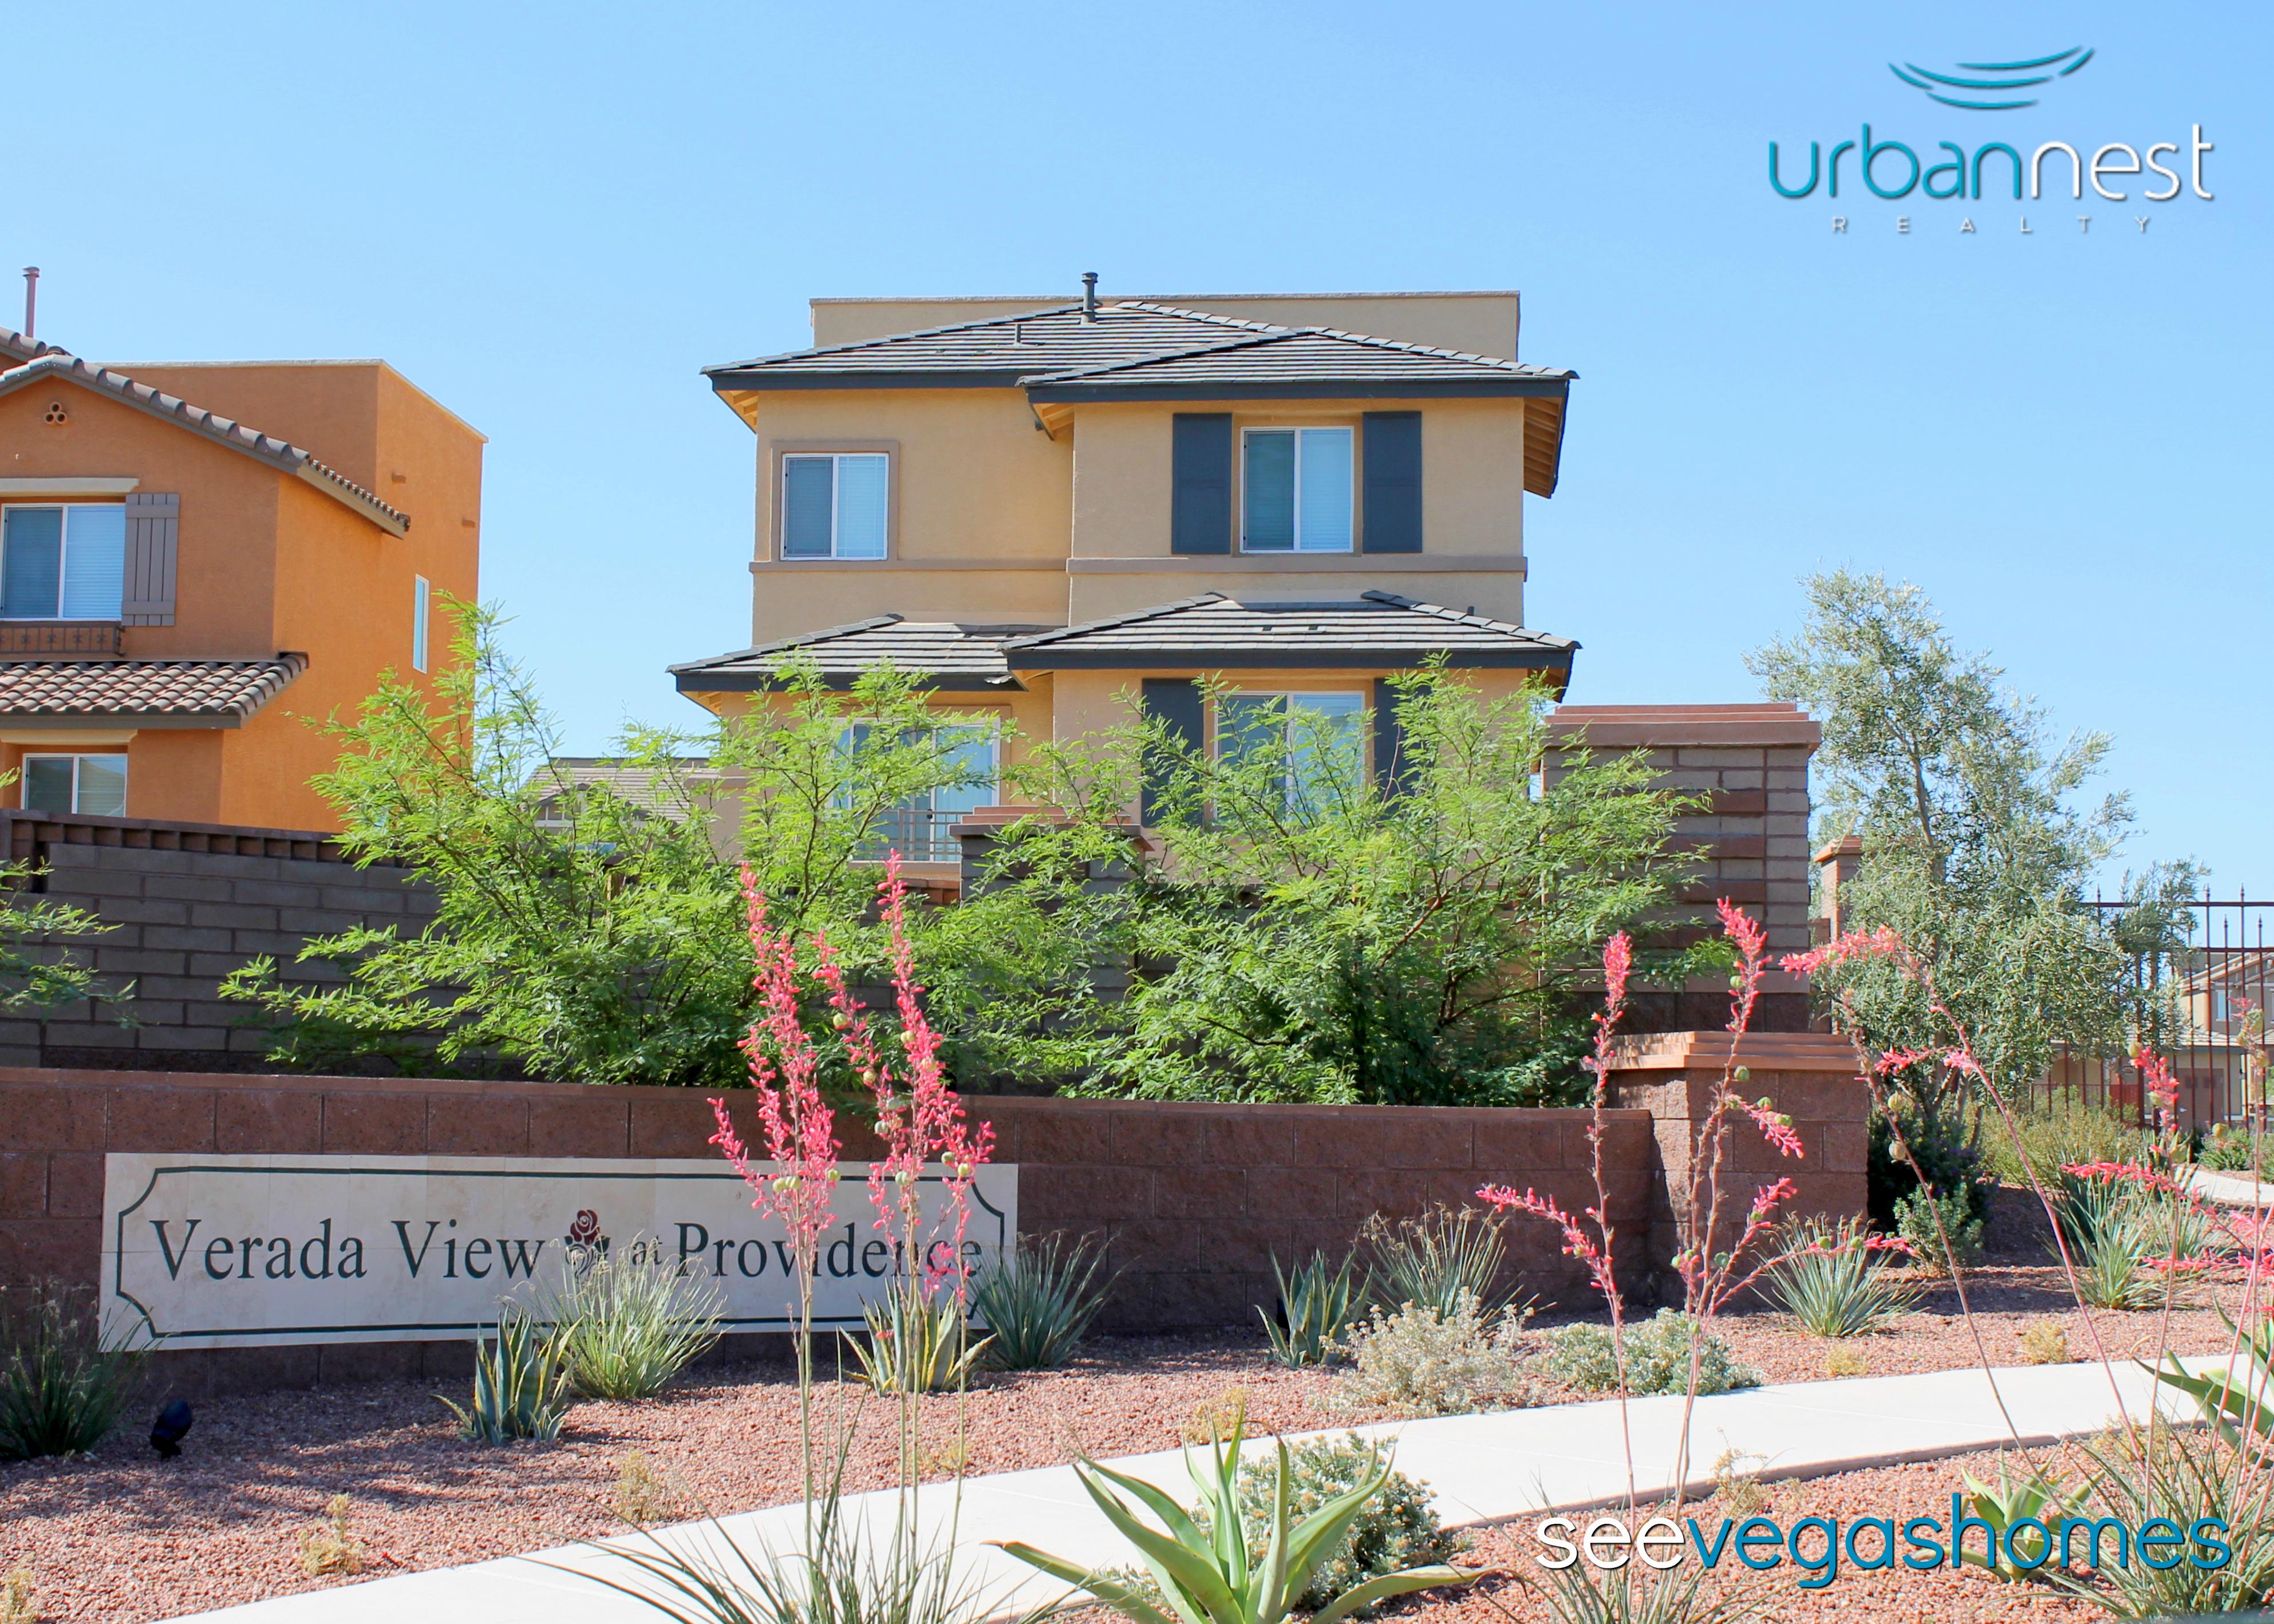 Verada View at Providence Las Vegas NV 89166 SeeVegasHomes